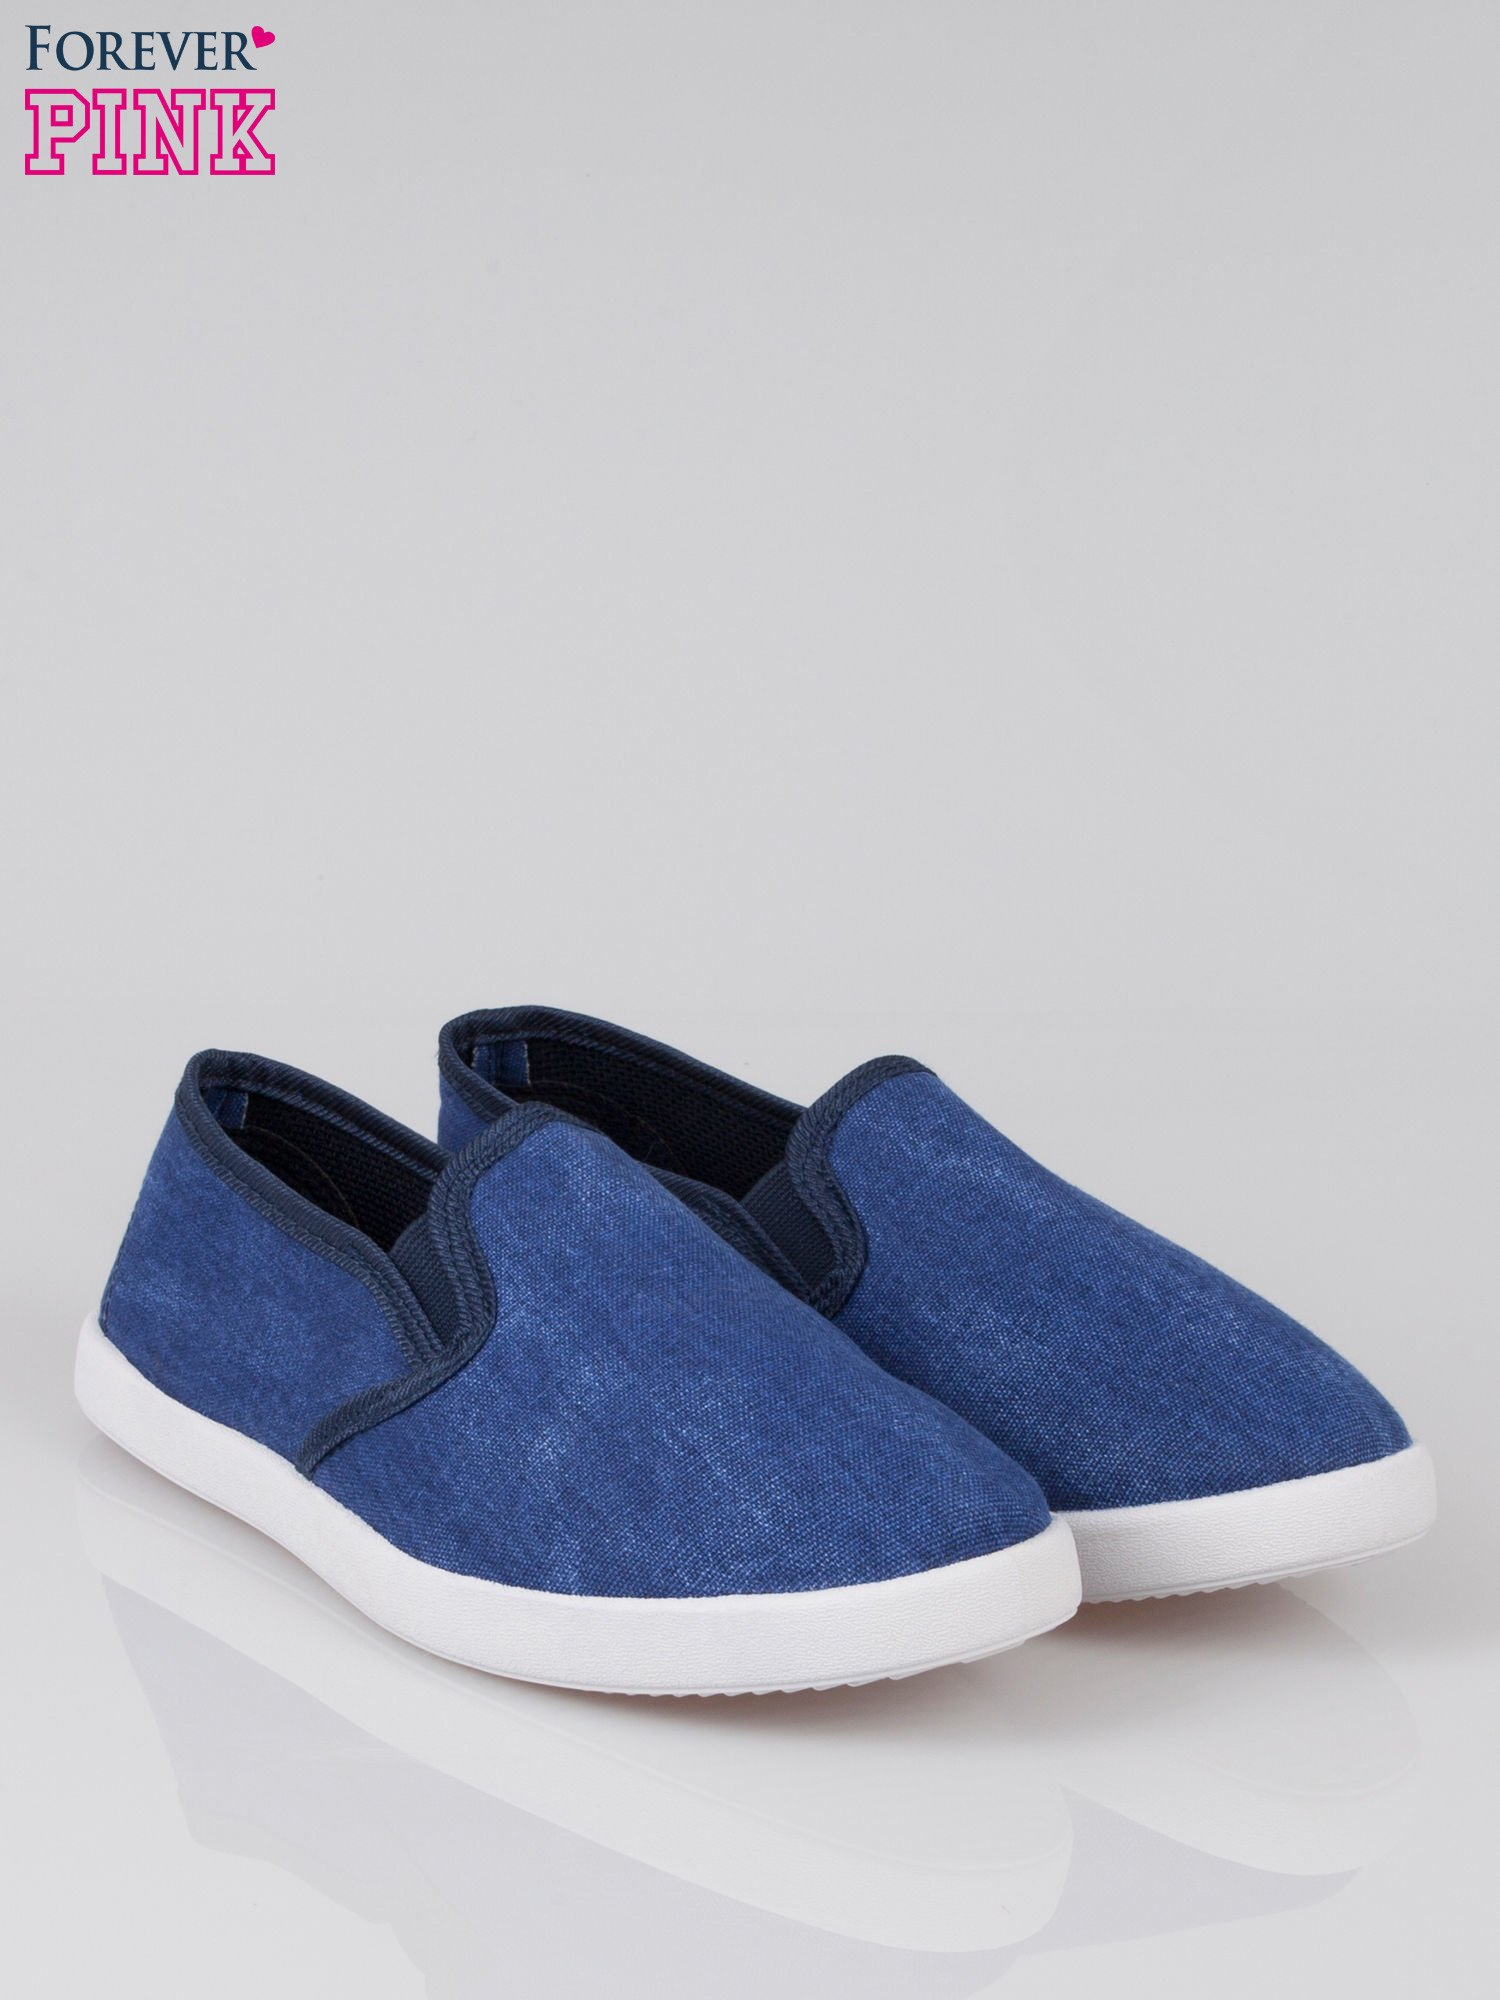 Granatowe jeansowe buty slip on                                  zdj.                                  2